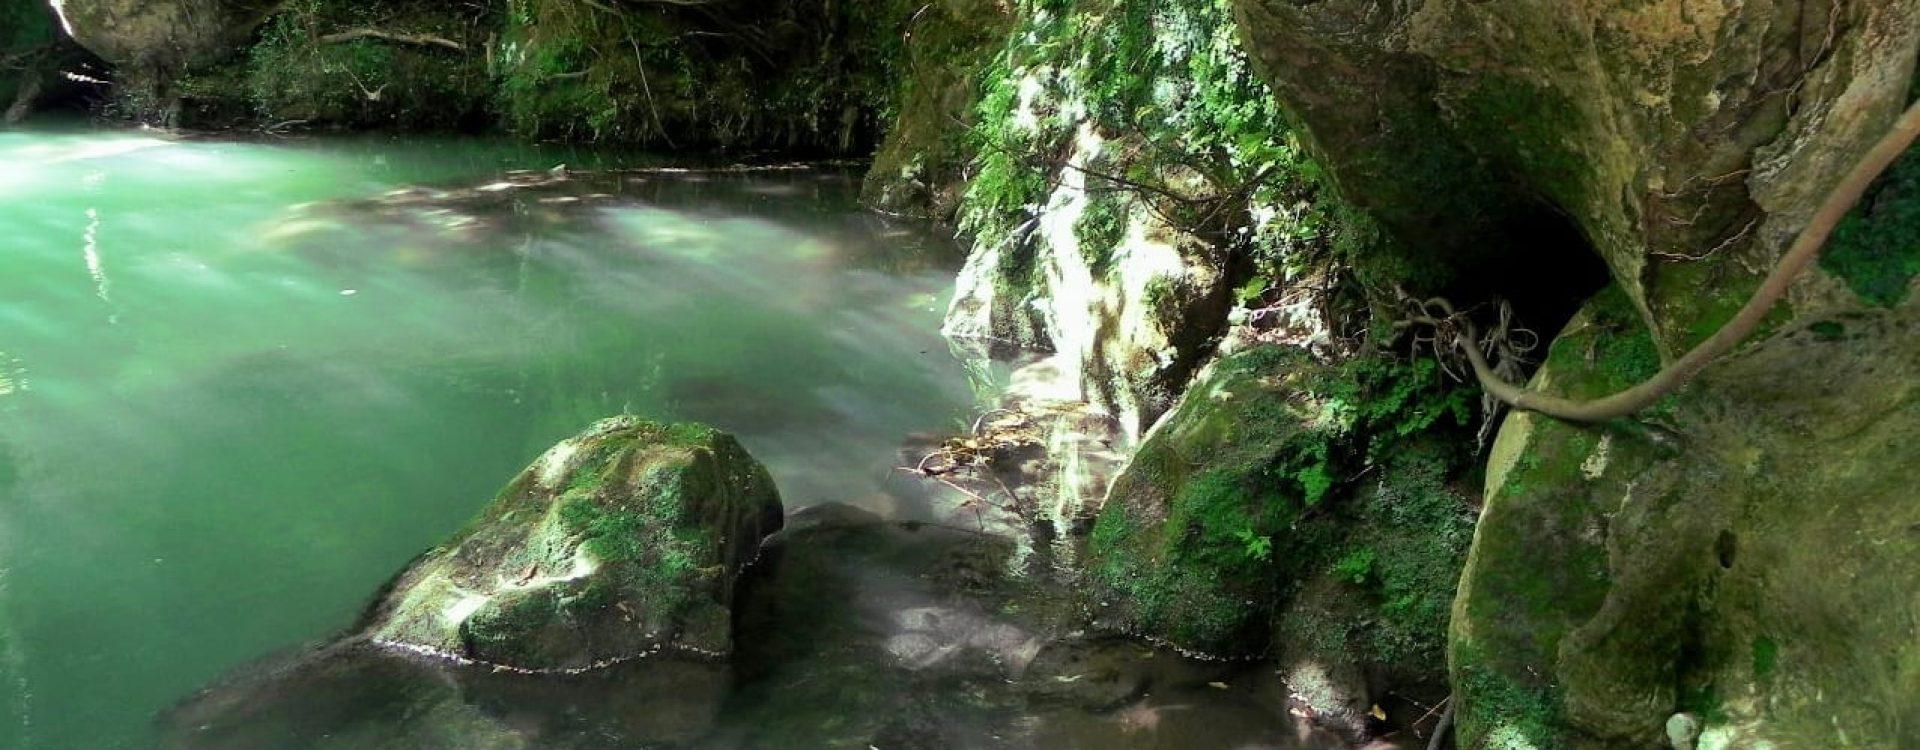 _fiume 6